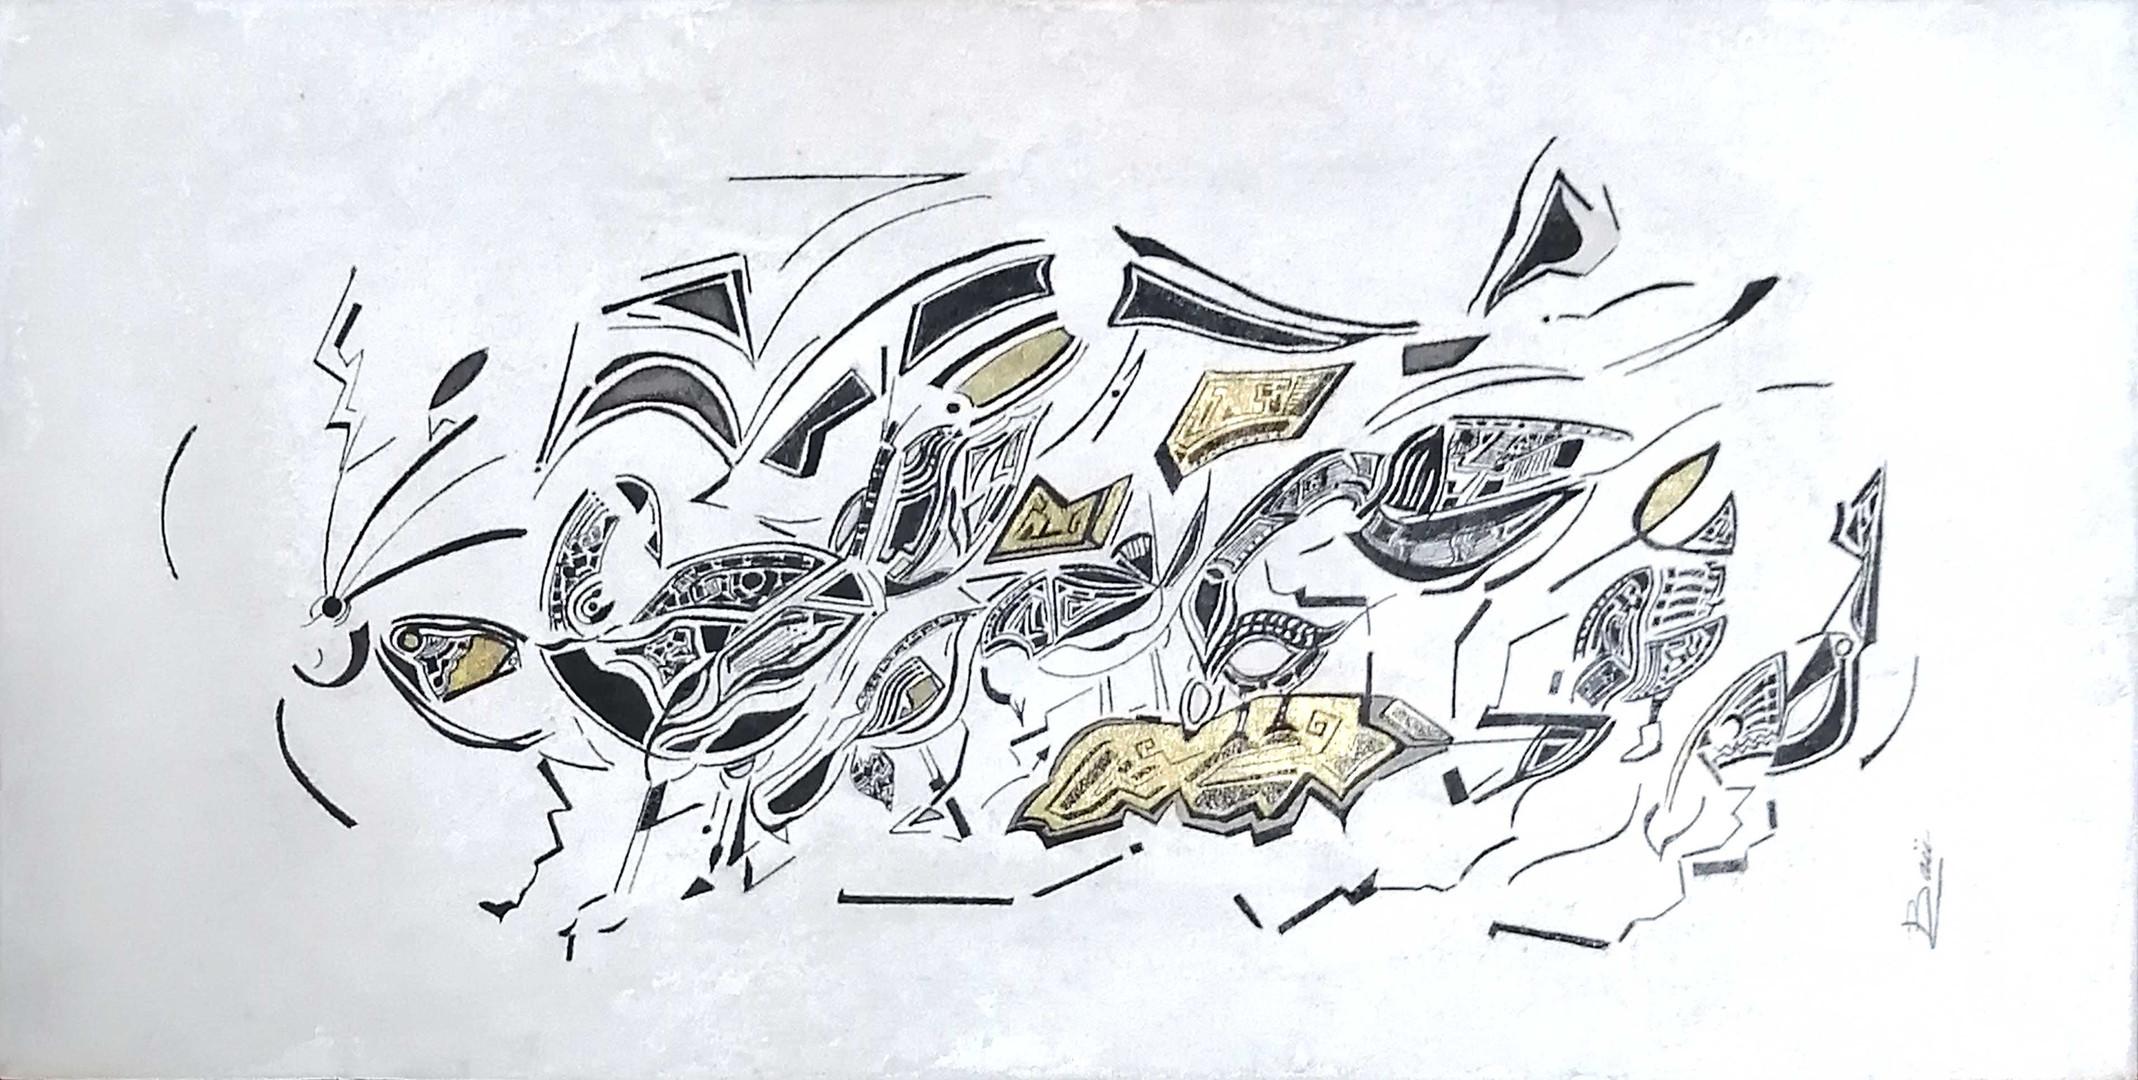 Heure dorée - 300$ - Vendu